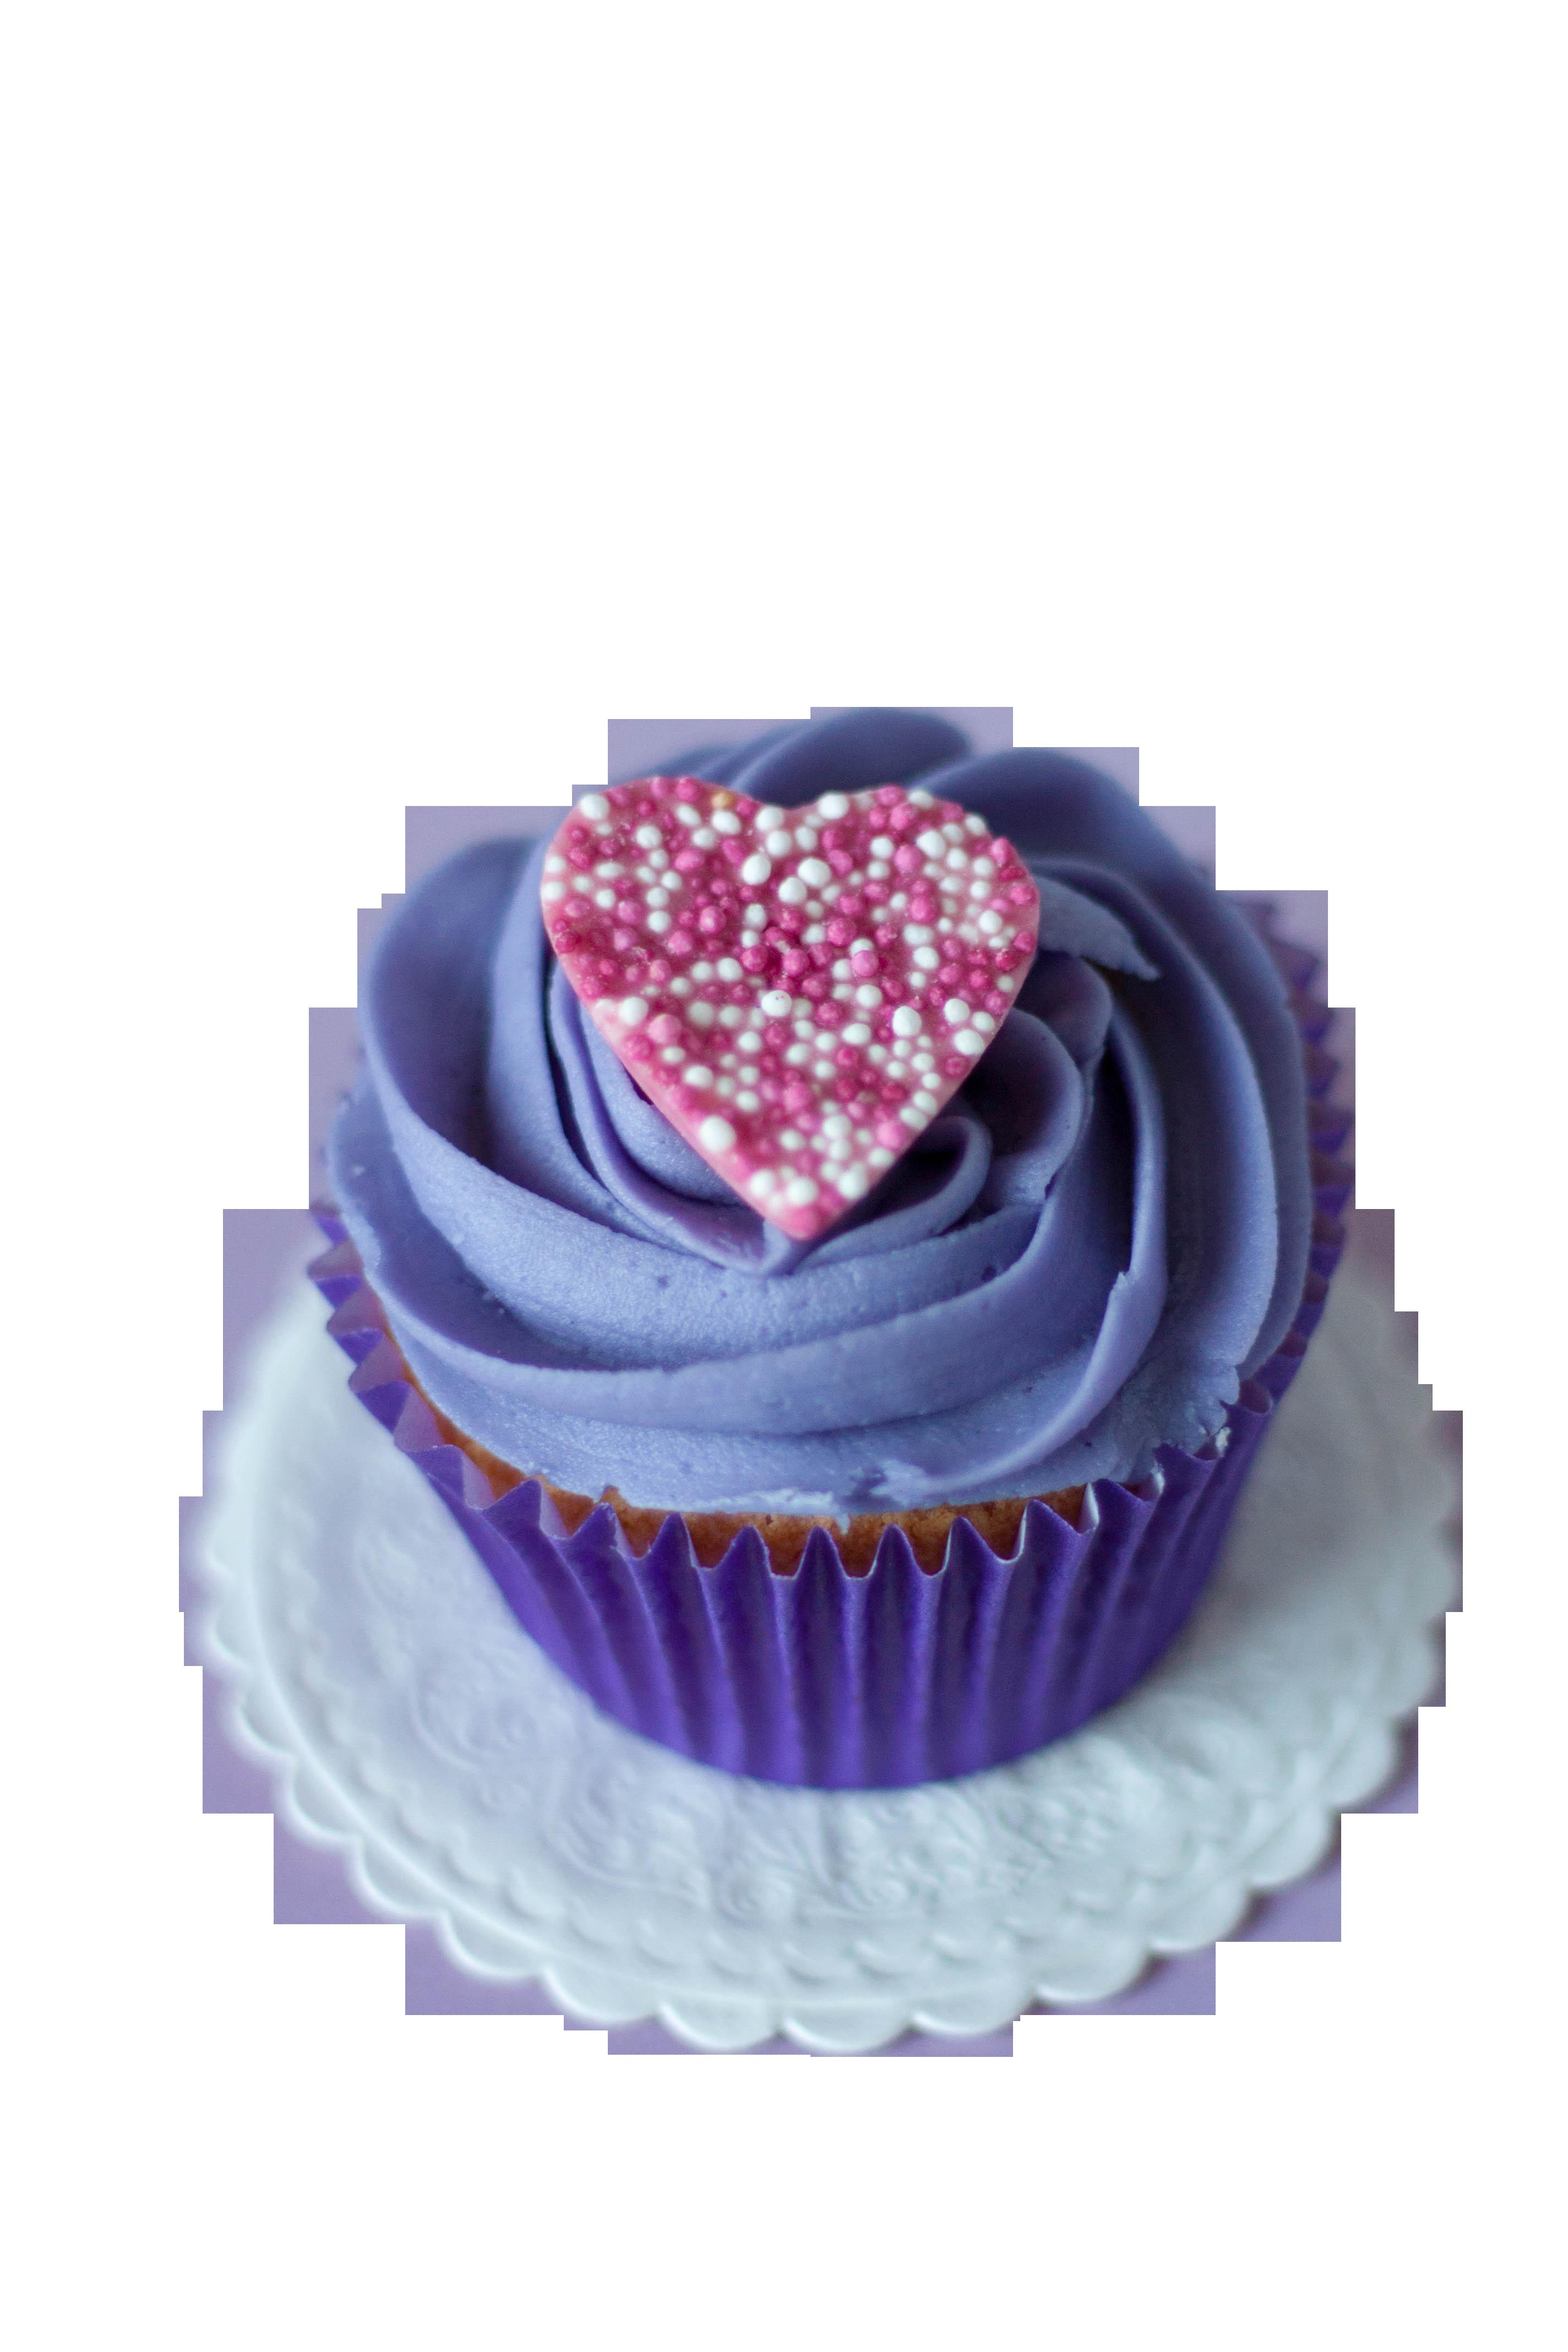 cupcakes-925826_Clip